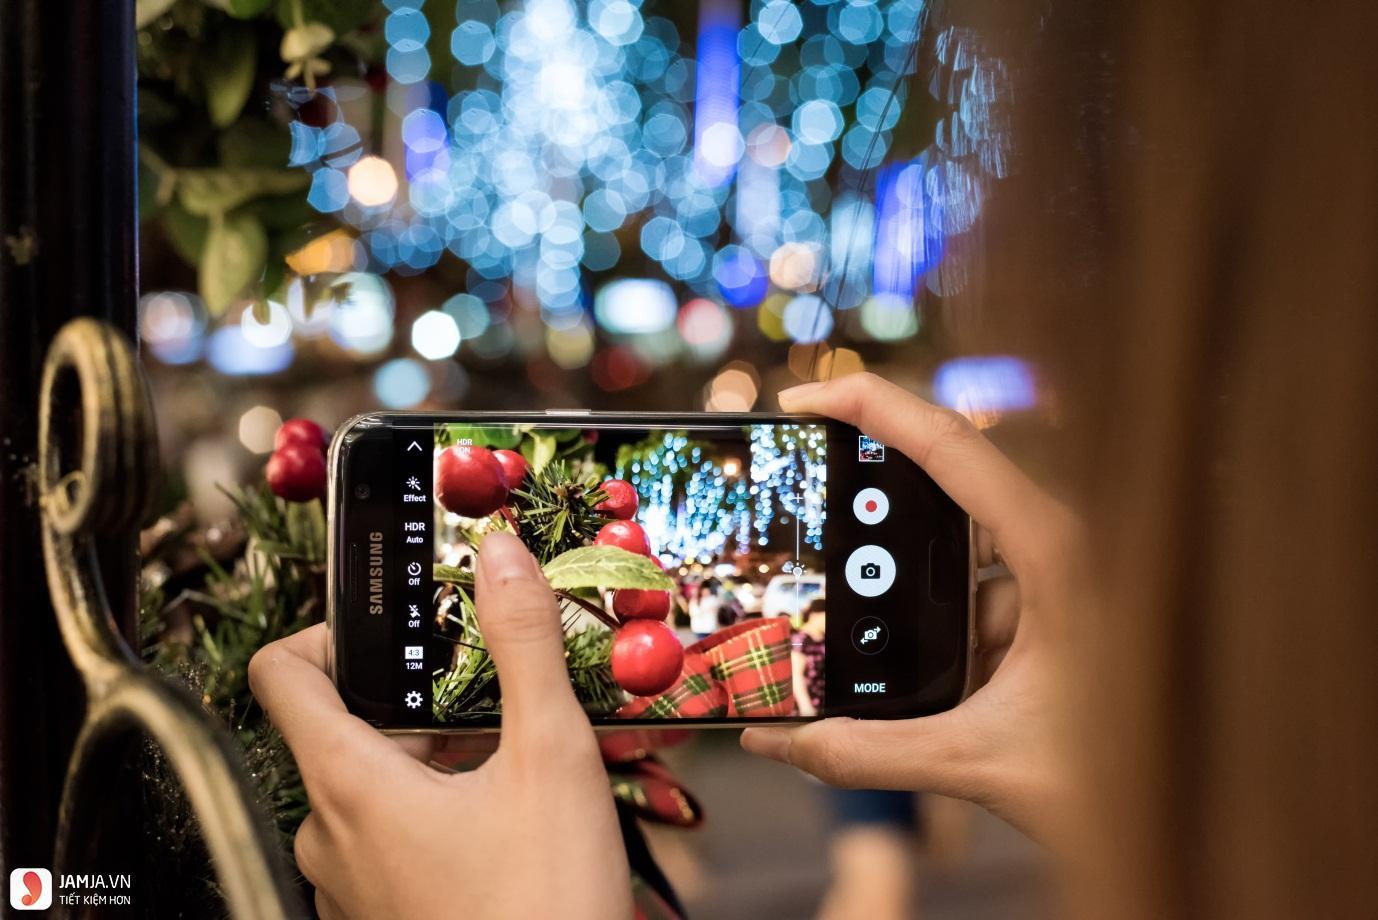 điện thoại Samsung S7 Edge camera